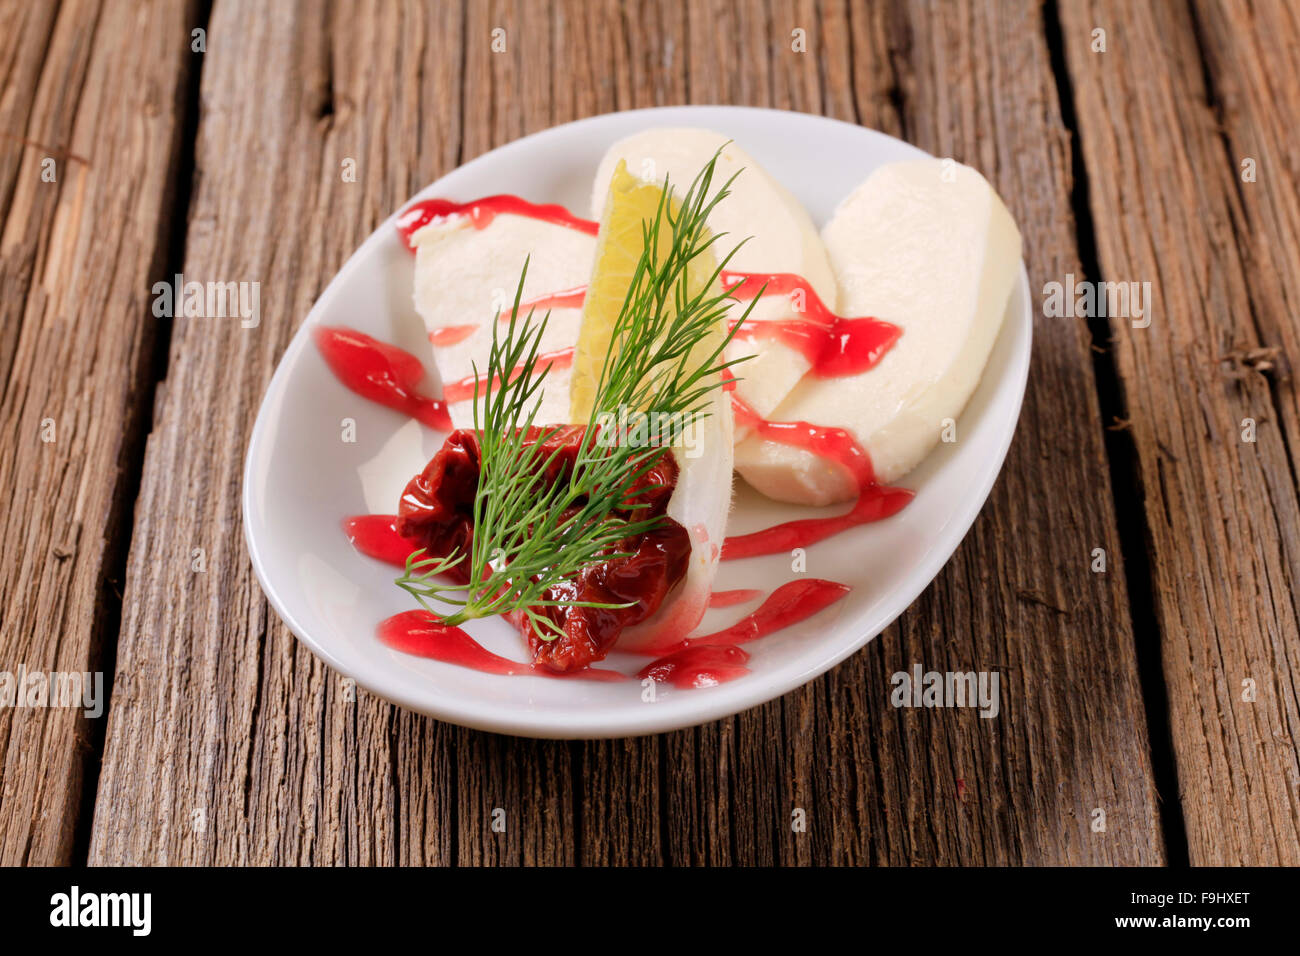 Mozzarella cheese with garnish and raspberry balsamic reduction Stock Photo